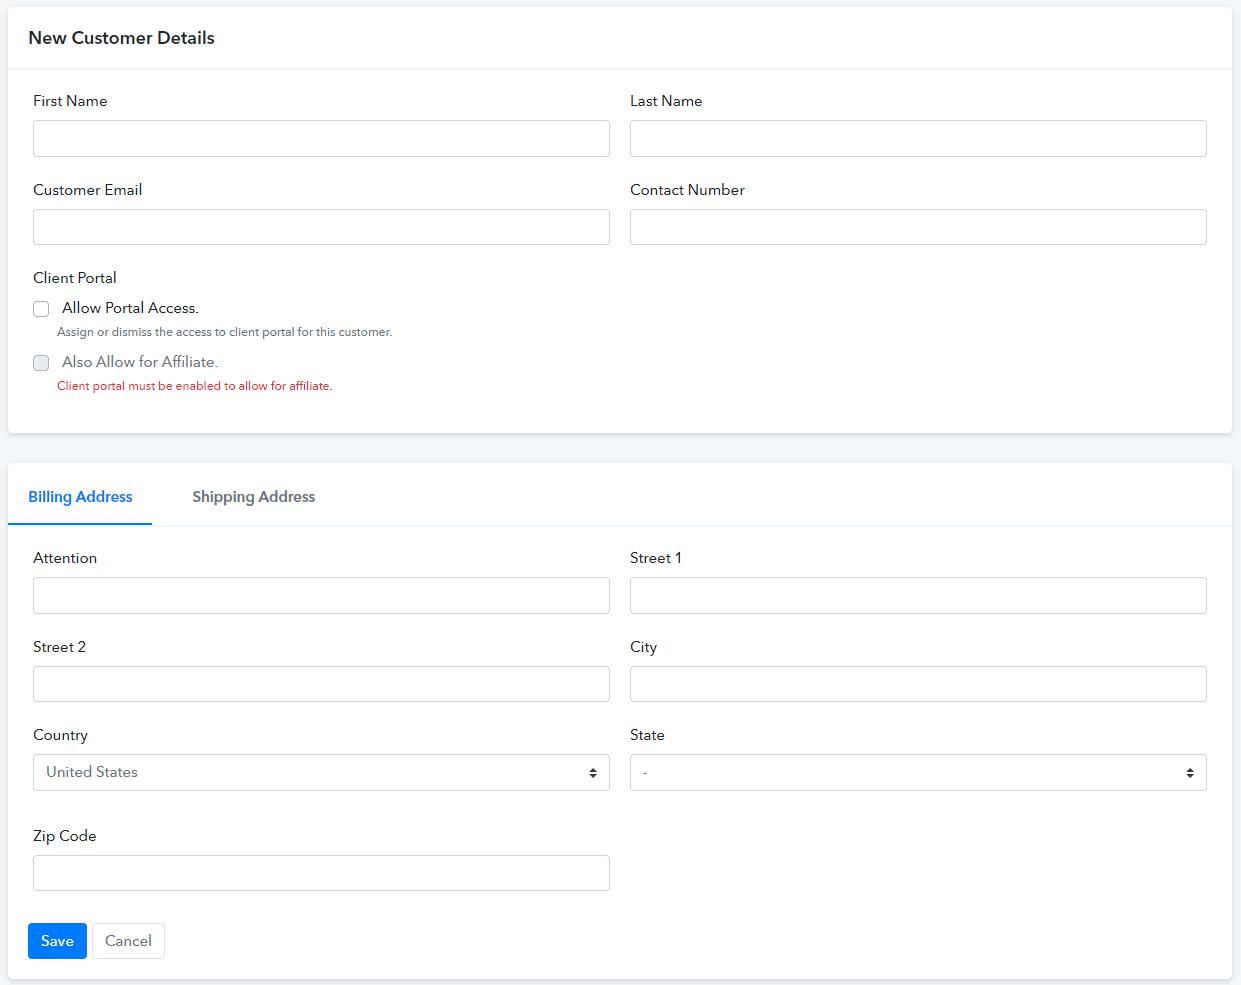 new_customer_details